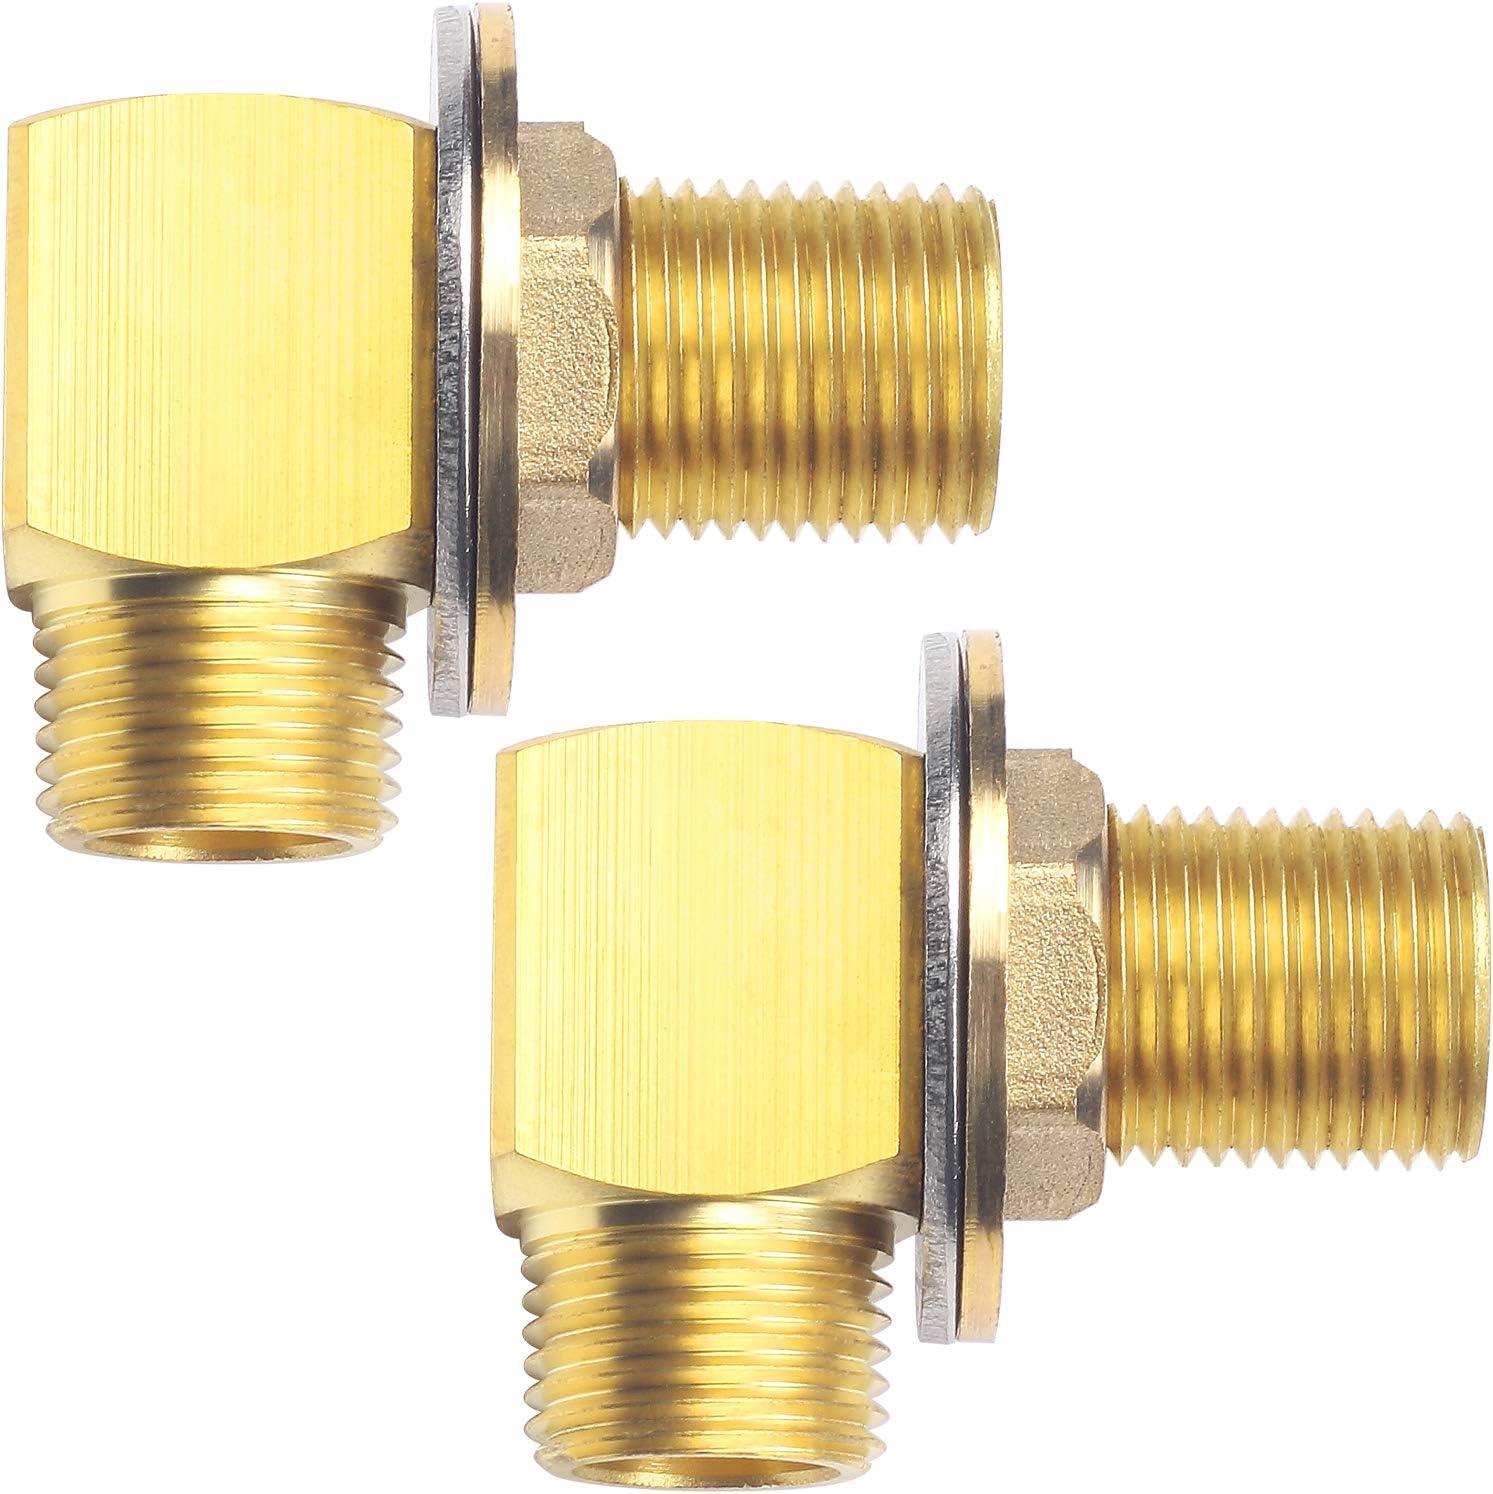 - IMLEZON Wall Mount Faucet Installation Kit For Back Splash Mount